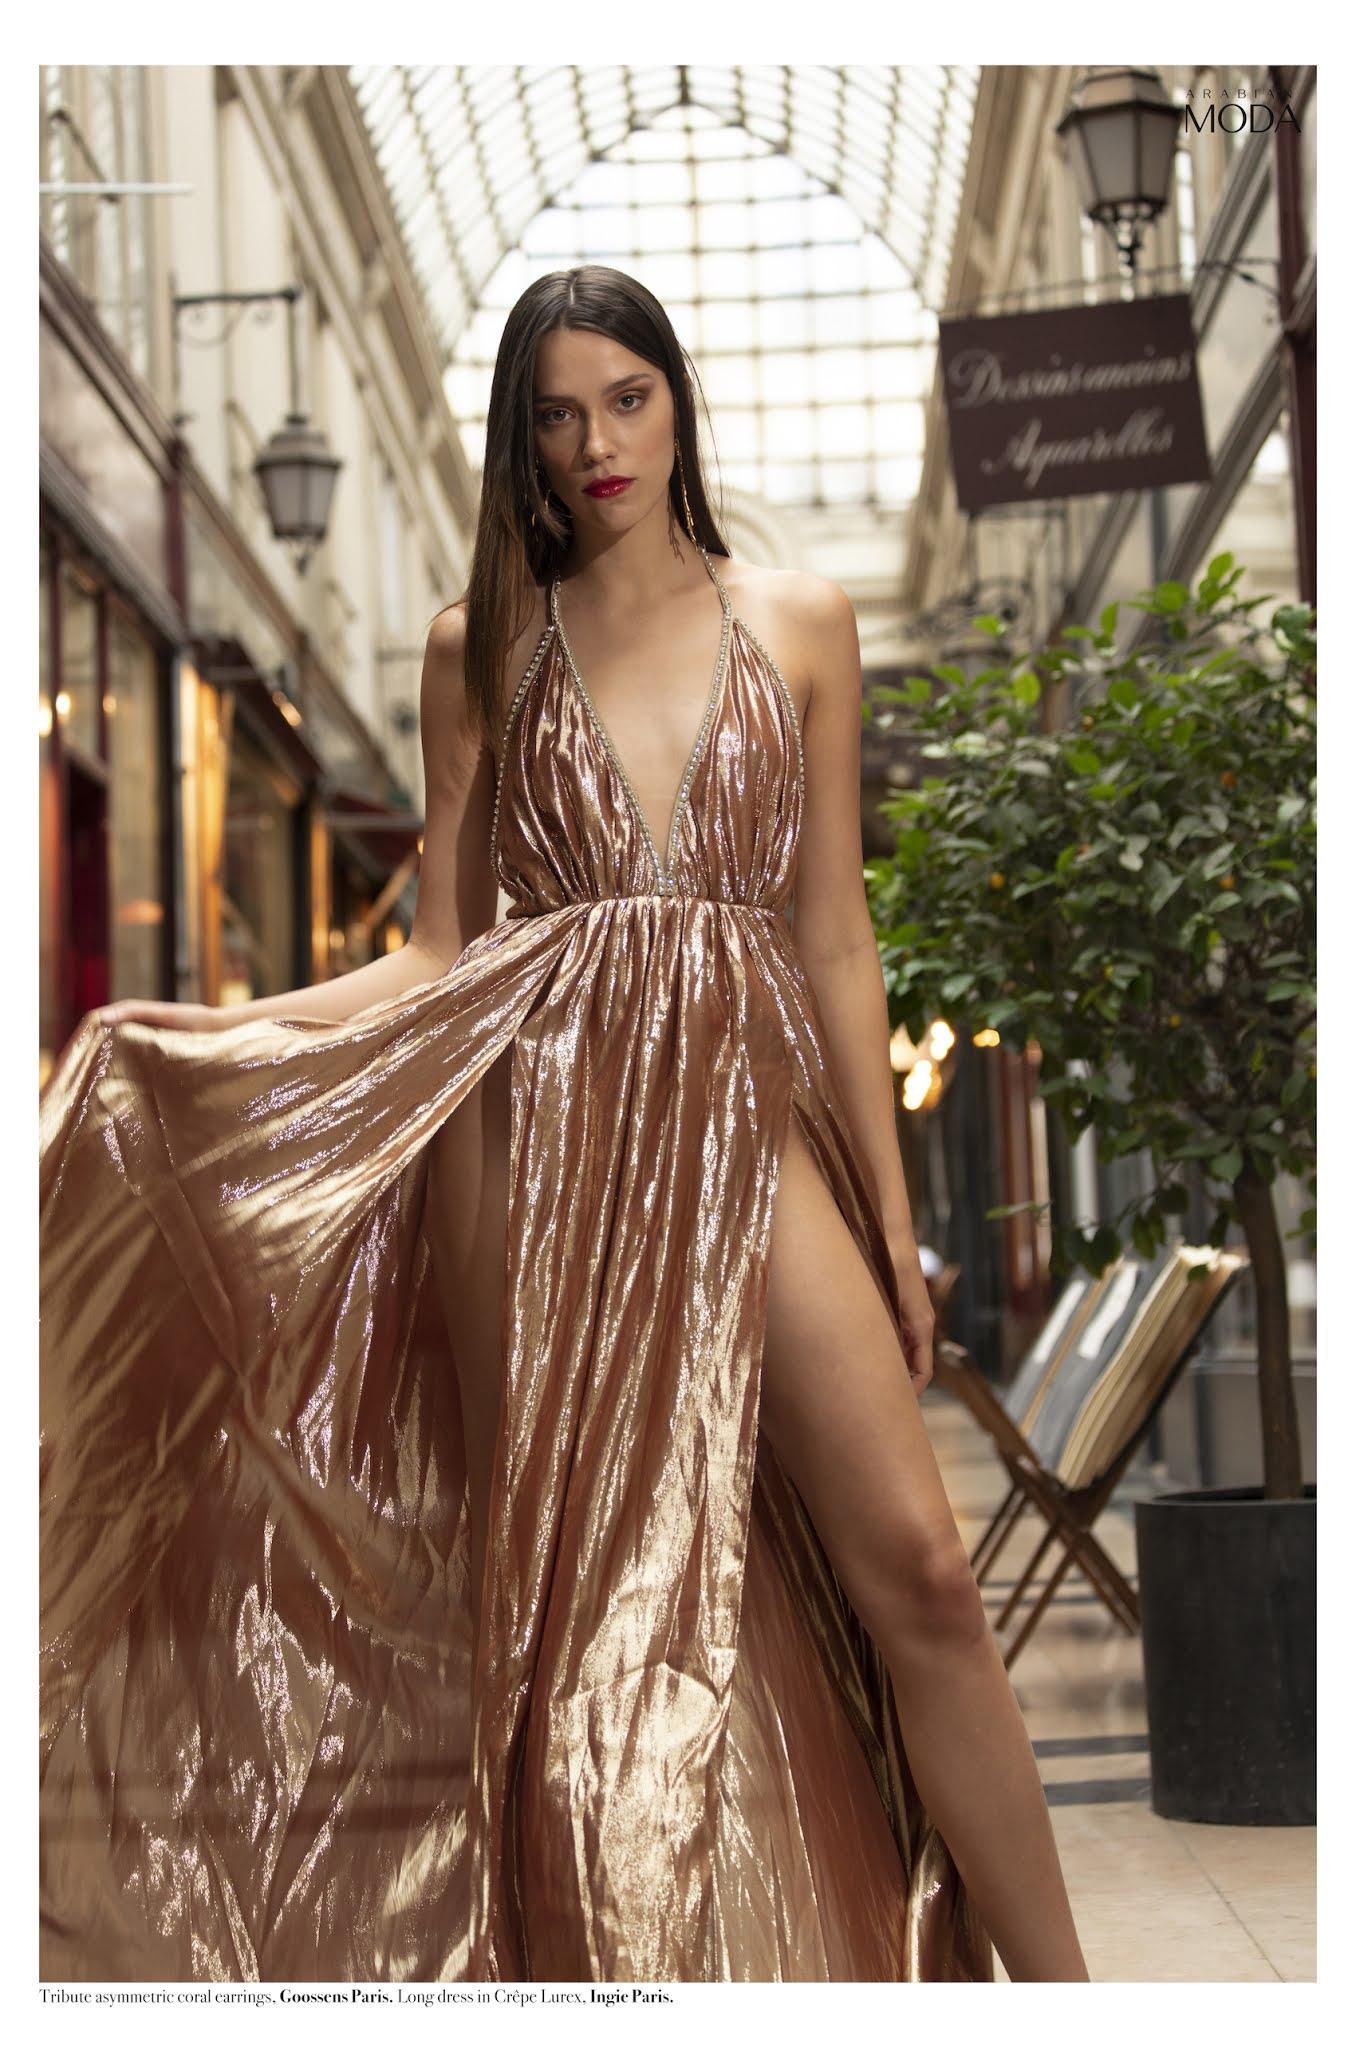 Arabian Moda x Ingie Paris x Goossens Paris